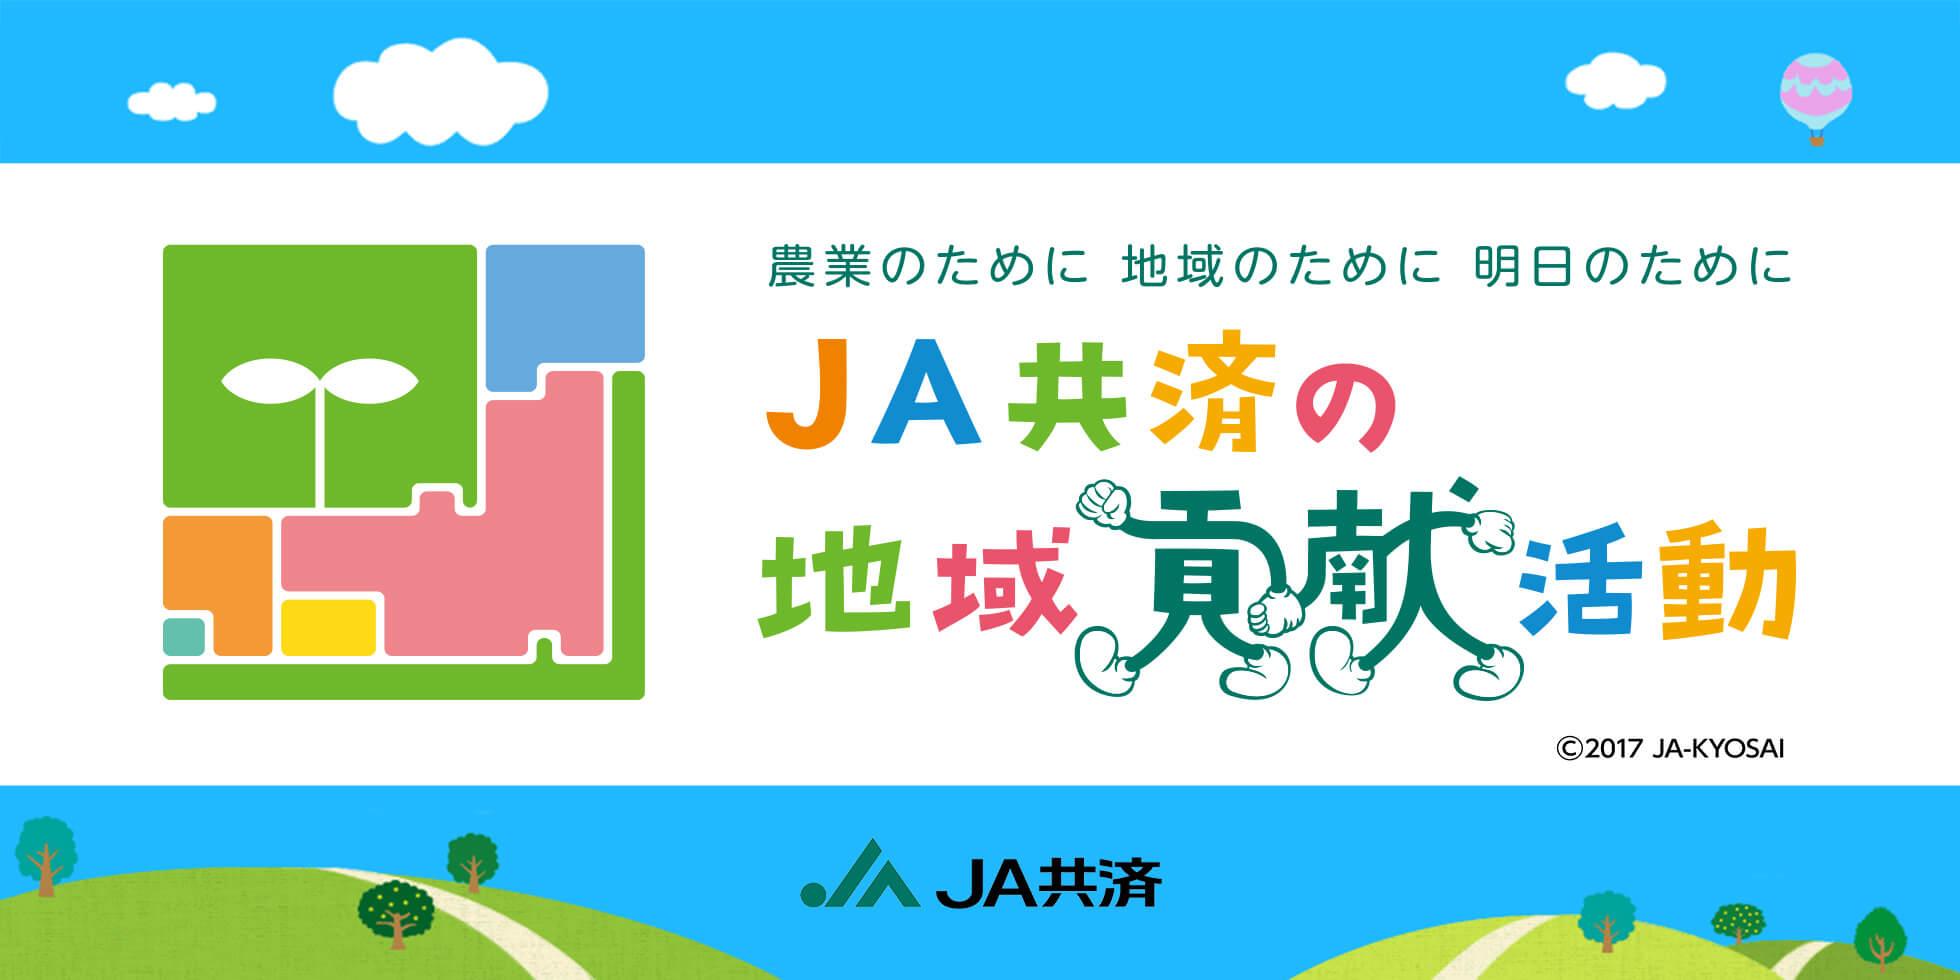 JA共済の地域貢献活動や、活動に関連するお役立ち情報をご紹介